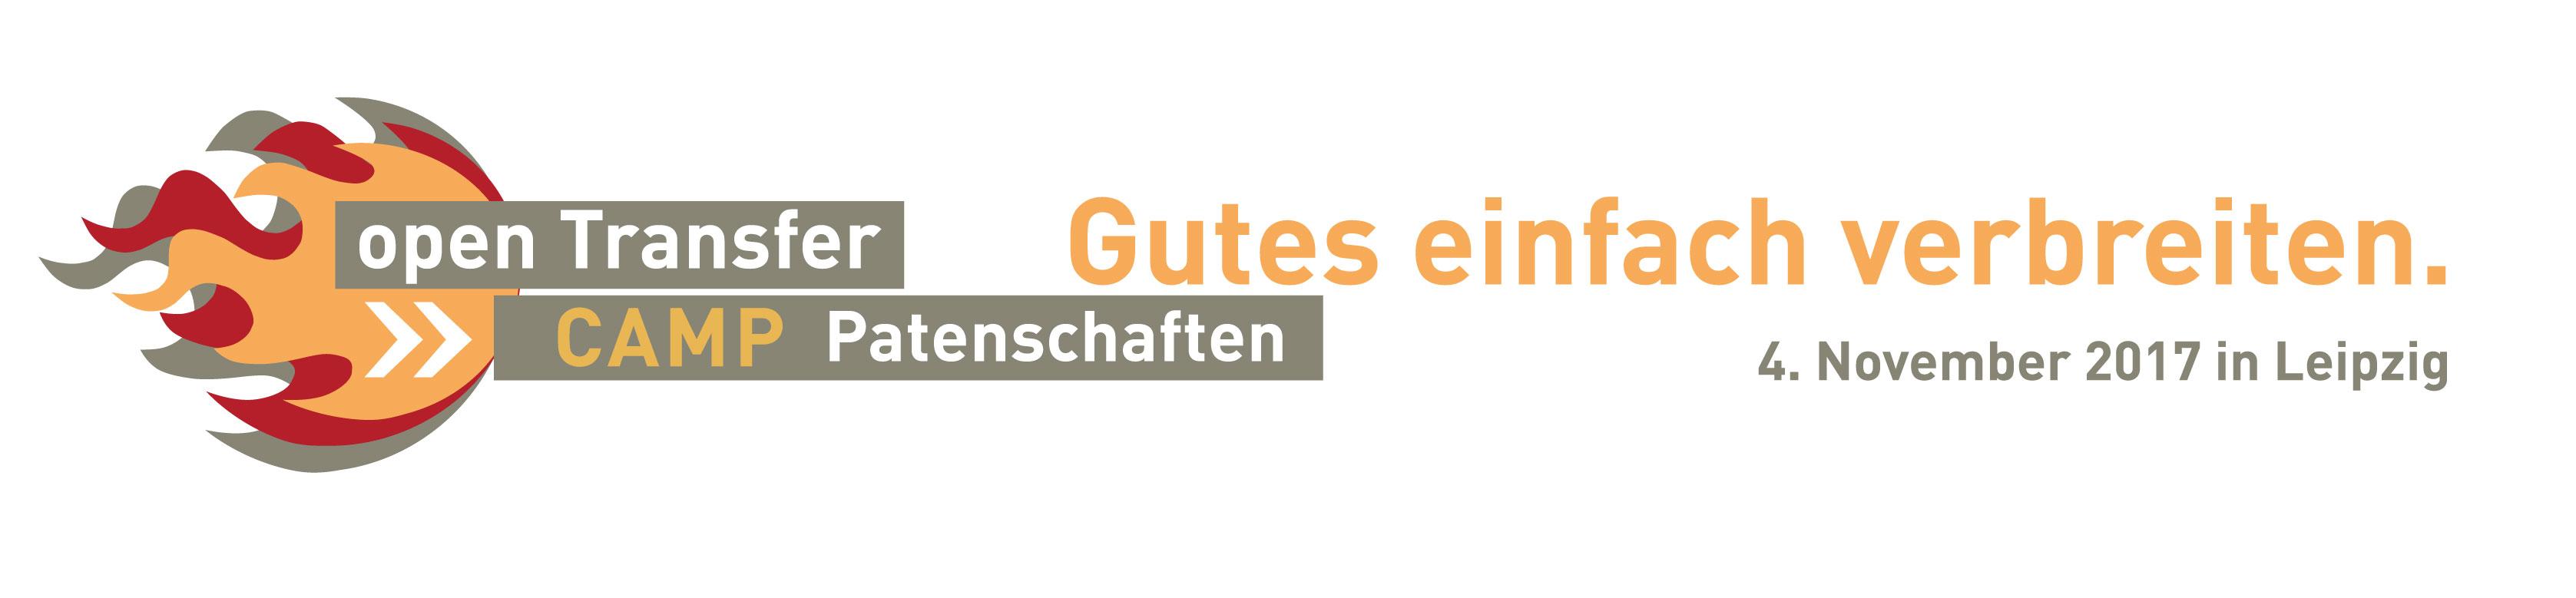 Logo des openTransfer CAMP #Patenschaften in Leipzig